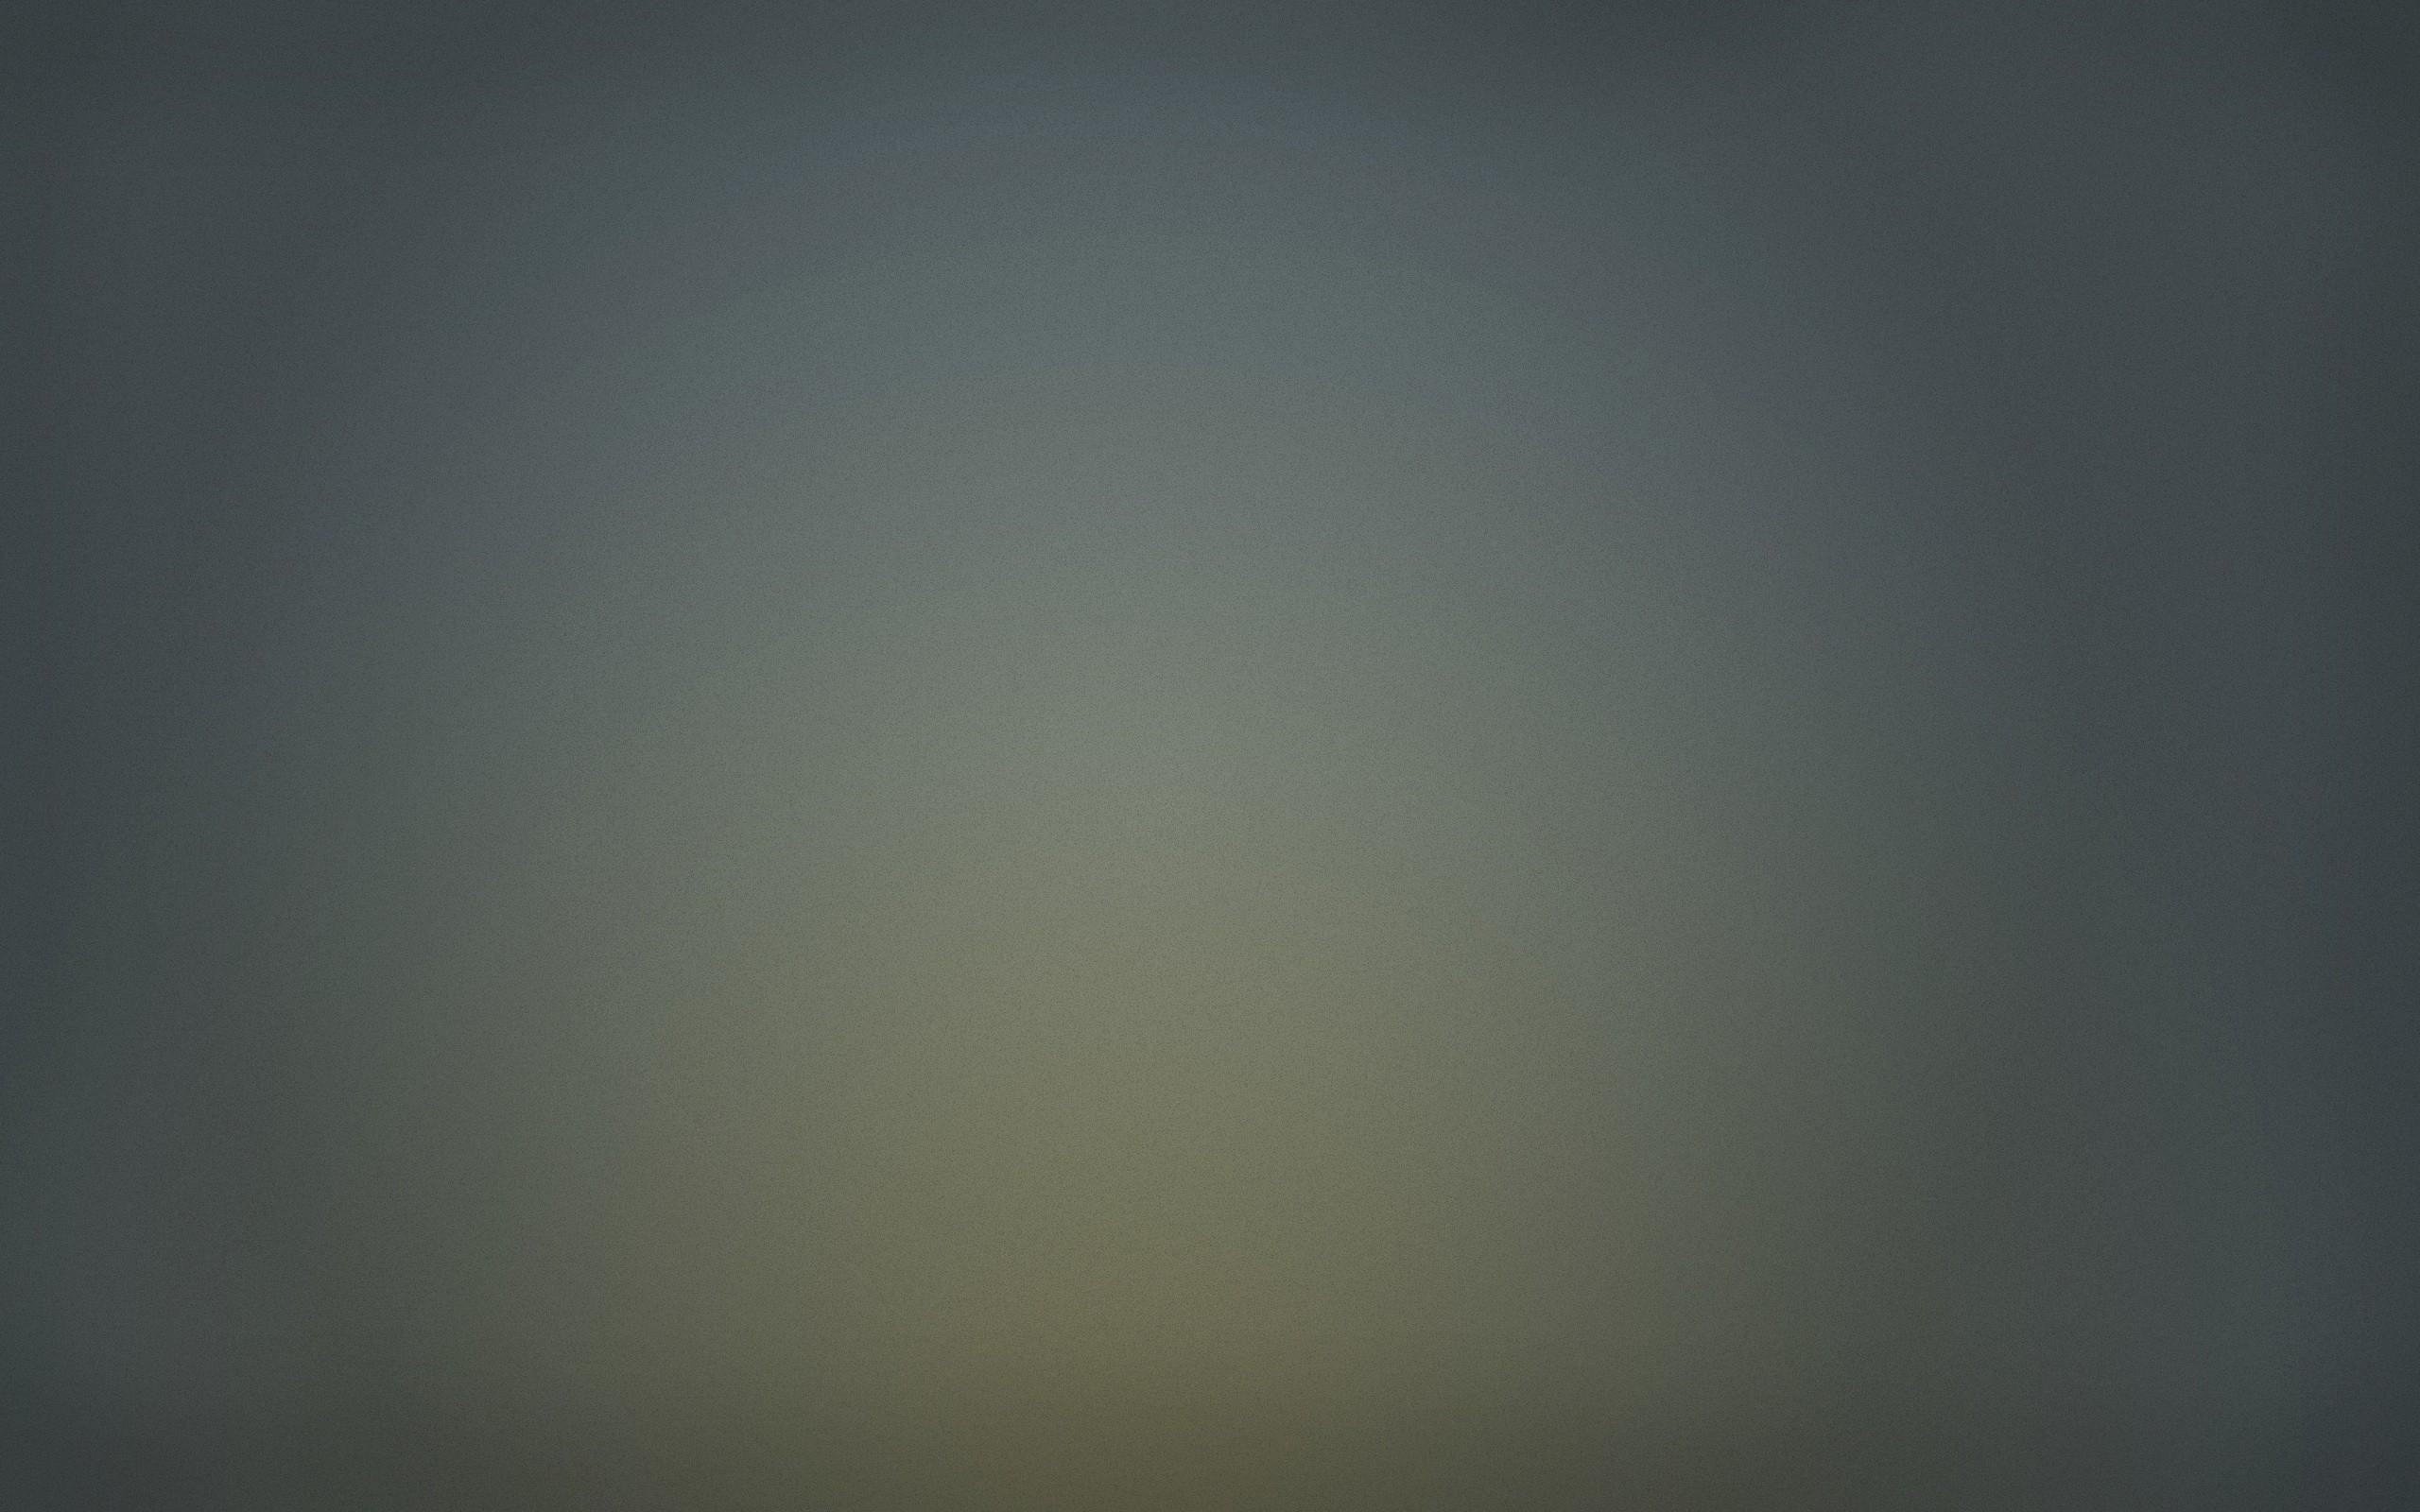 Gray | Background ID:779912762